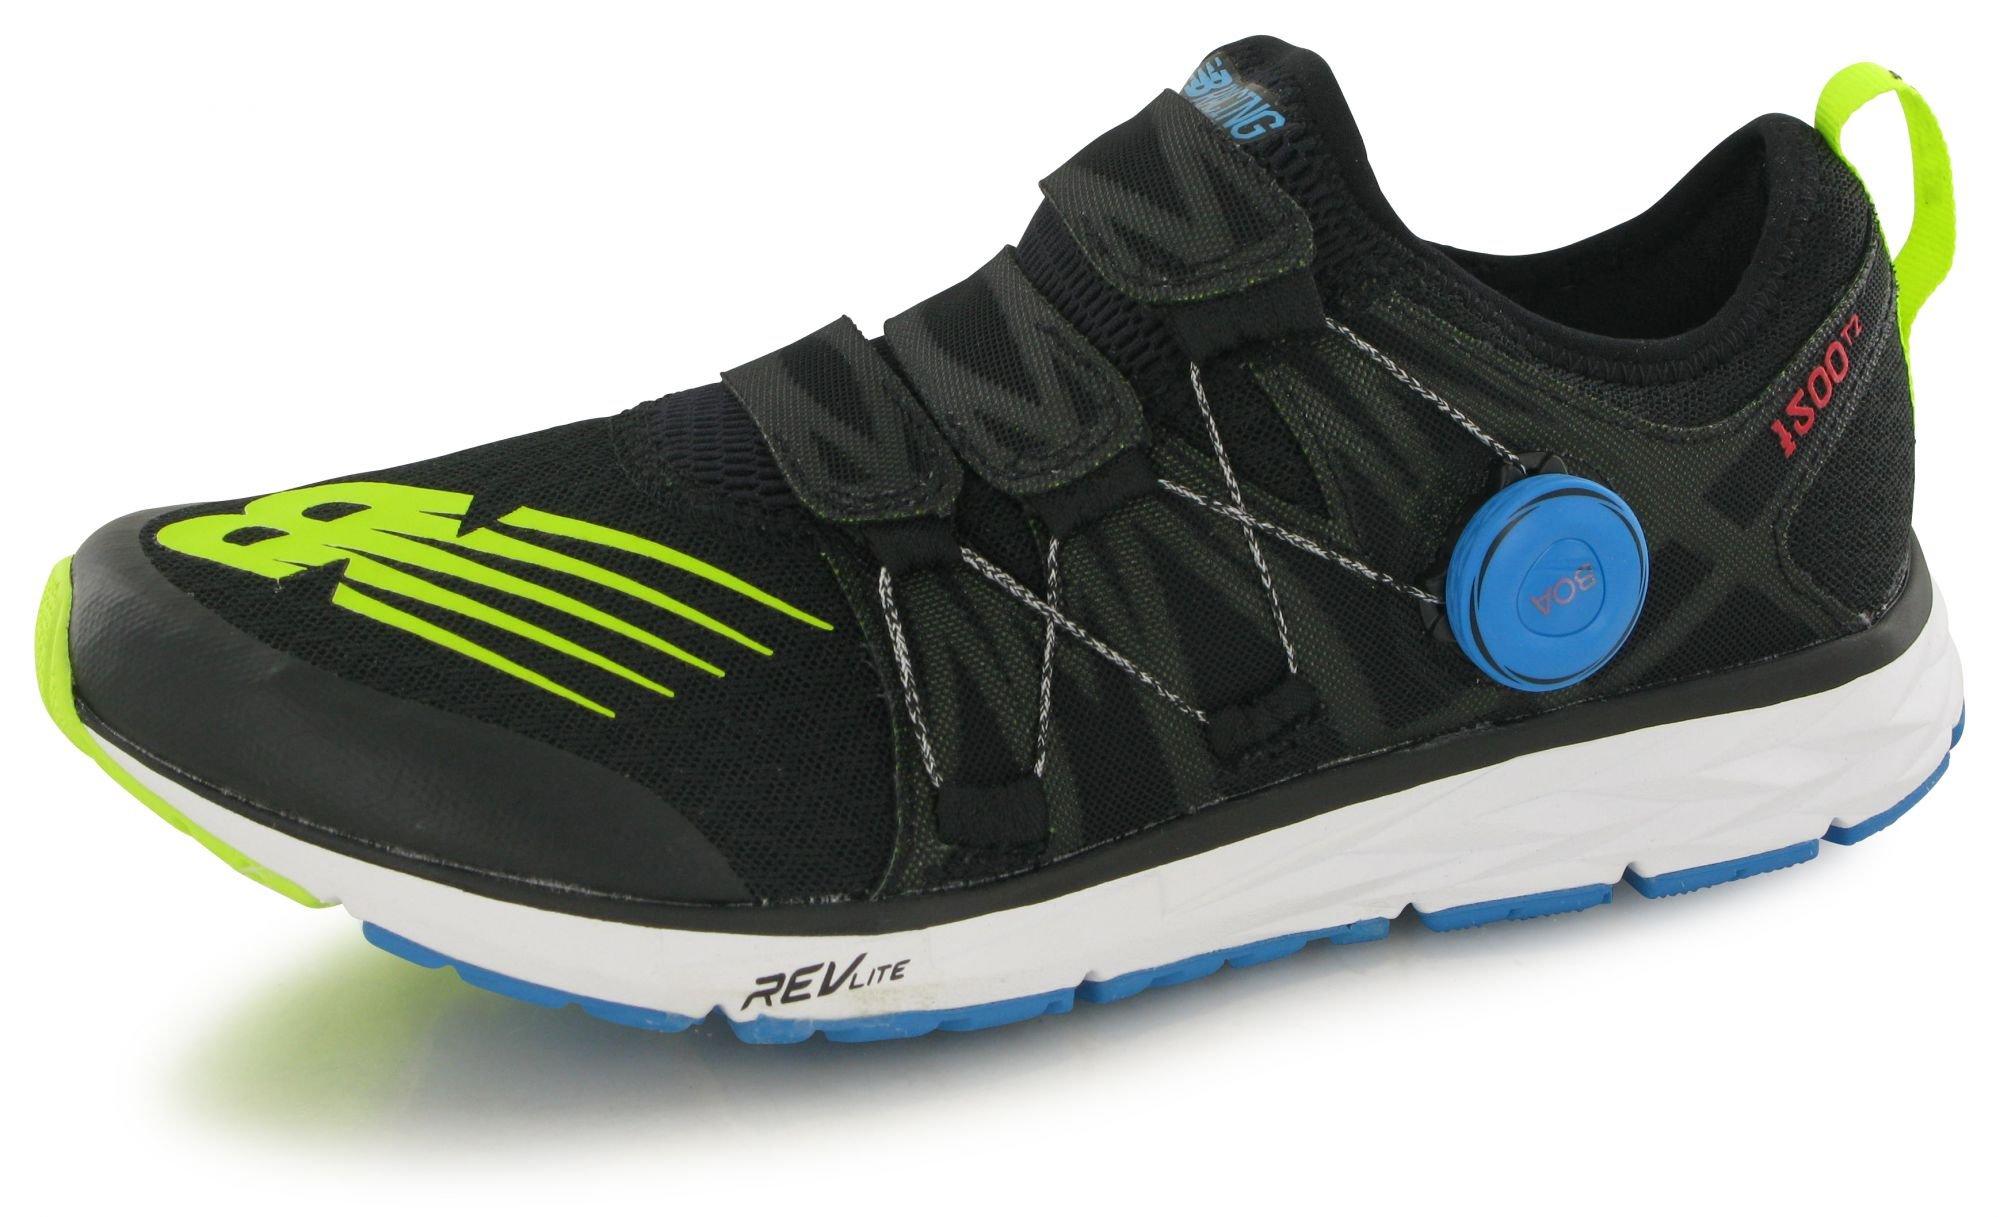 71bPIUWUZOL - New Balance Men's M1500v4 Boa Closure Running Shoes